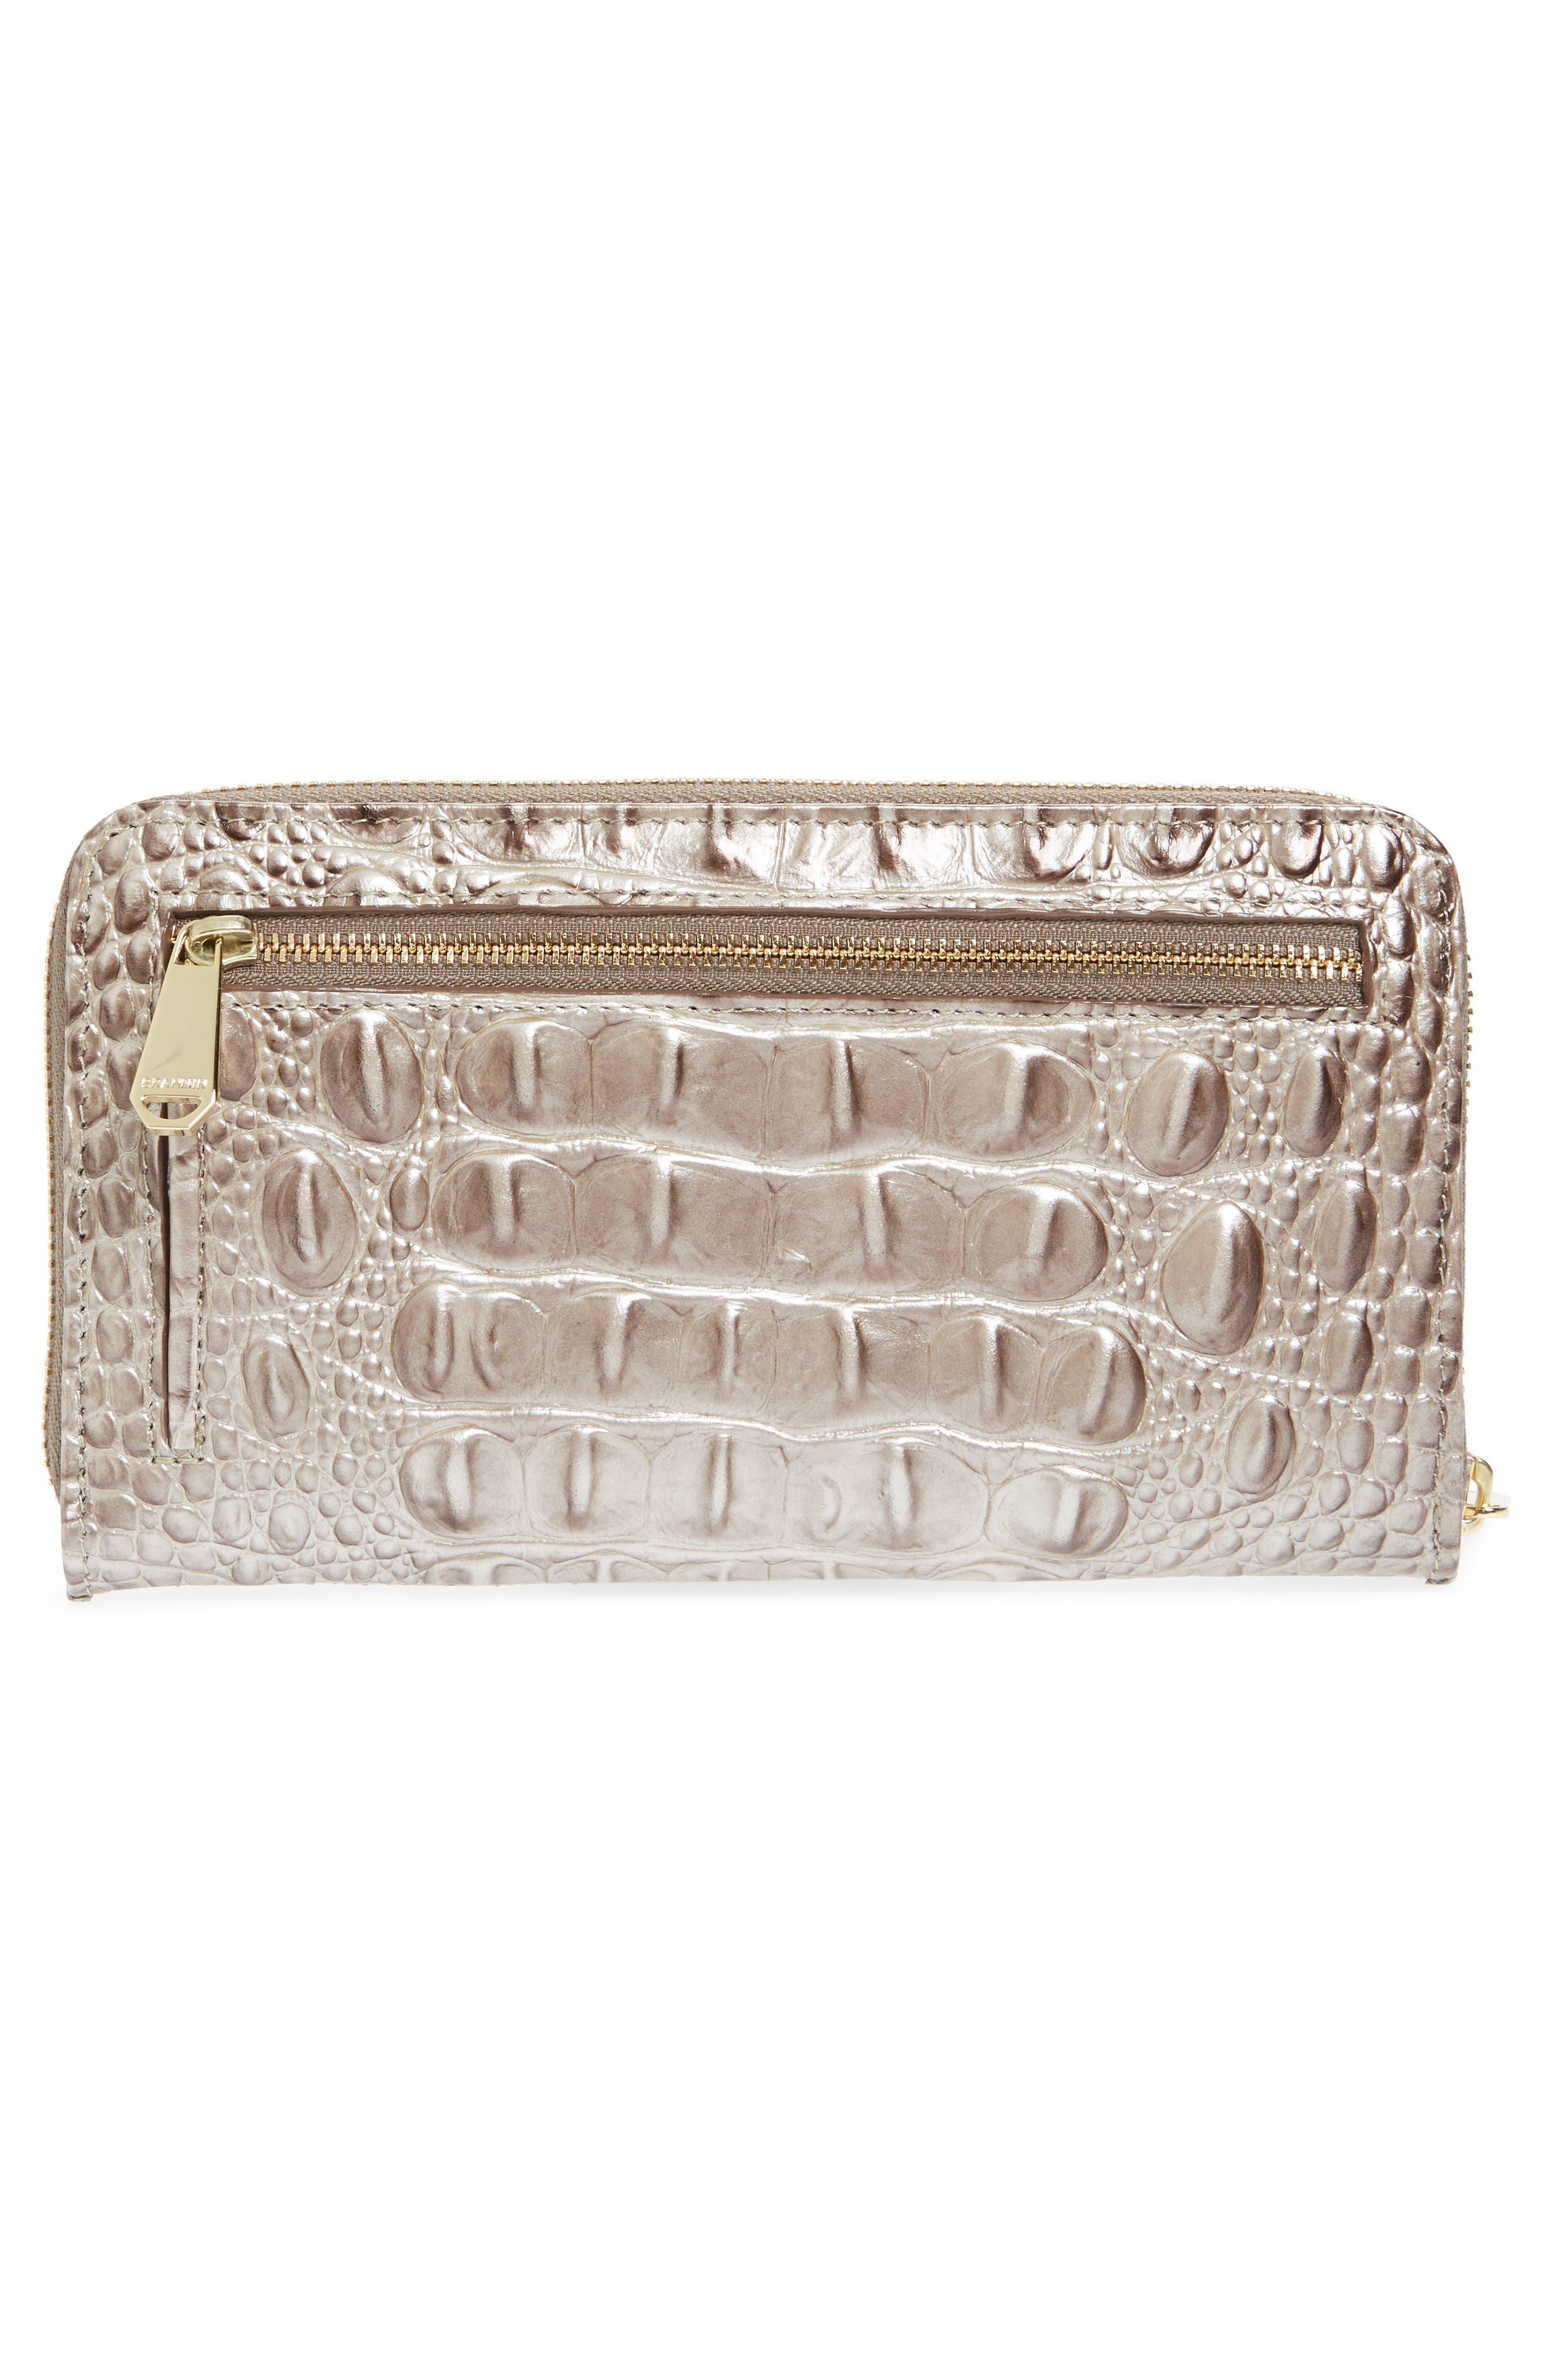 Suri Leather Zip Around Wallet,                             Alternate thumbnail 4, color,                             Chardonnay